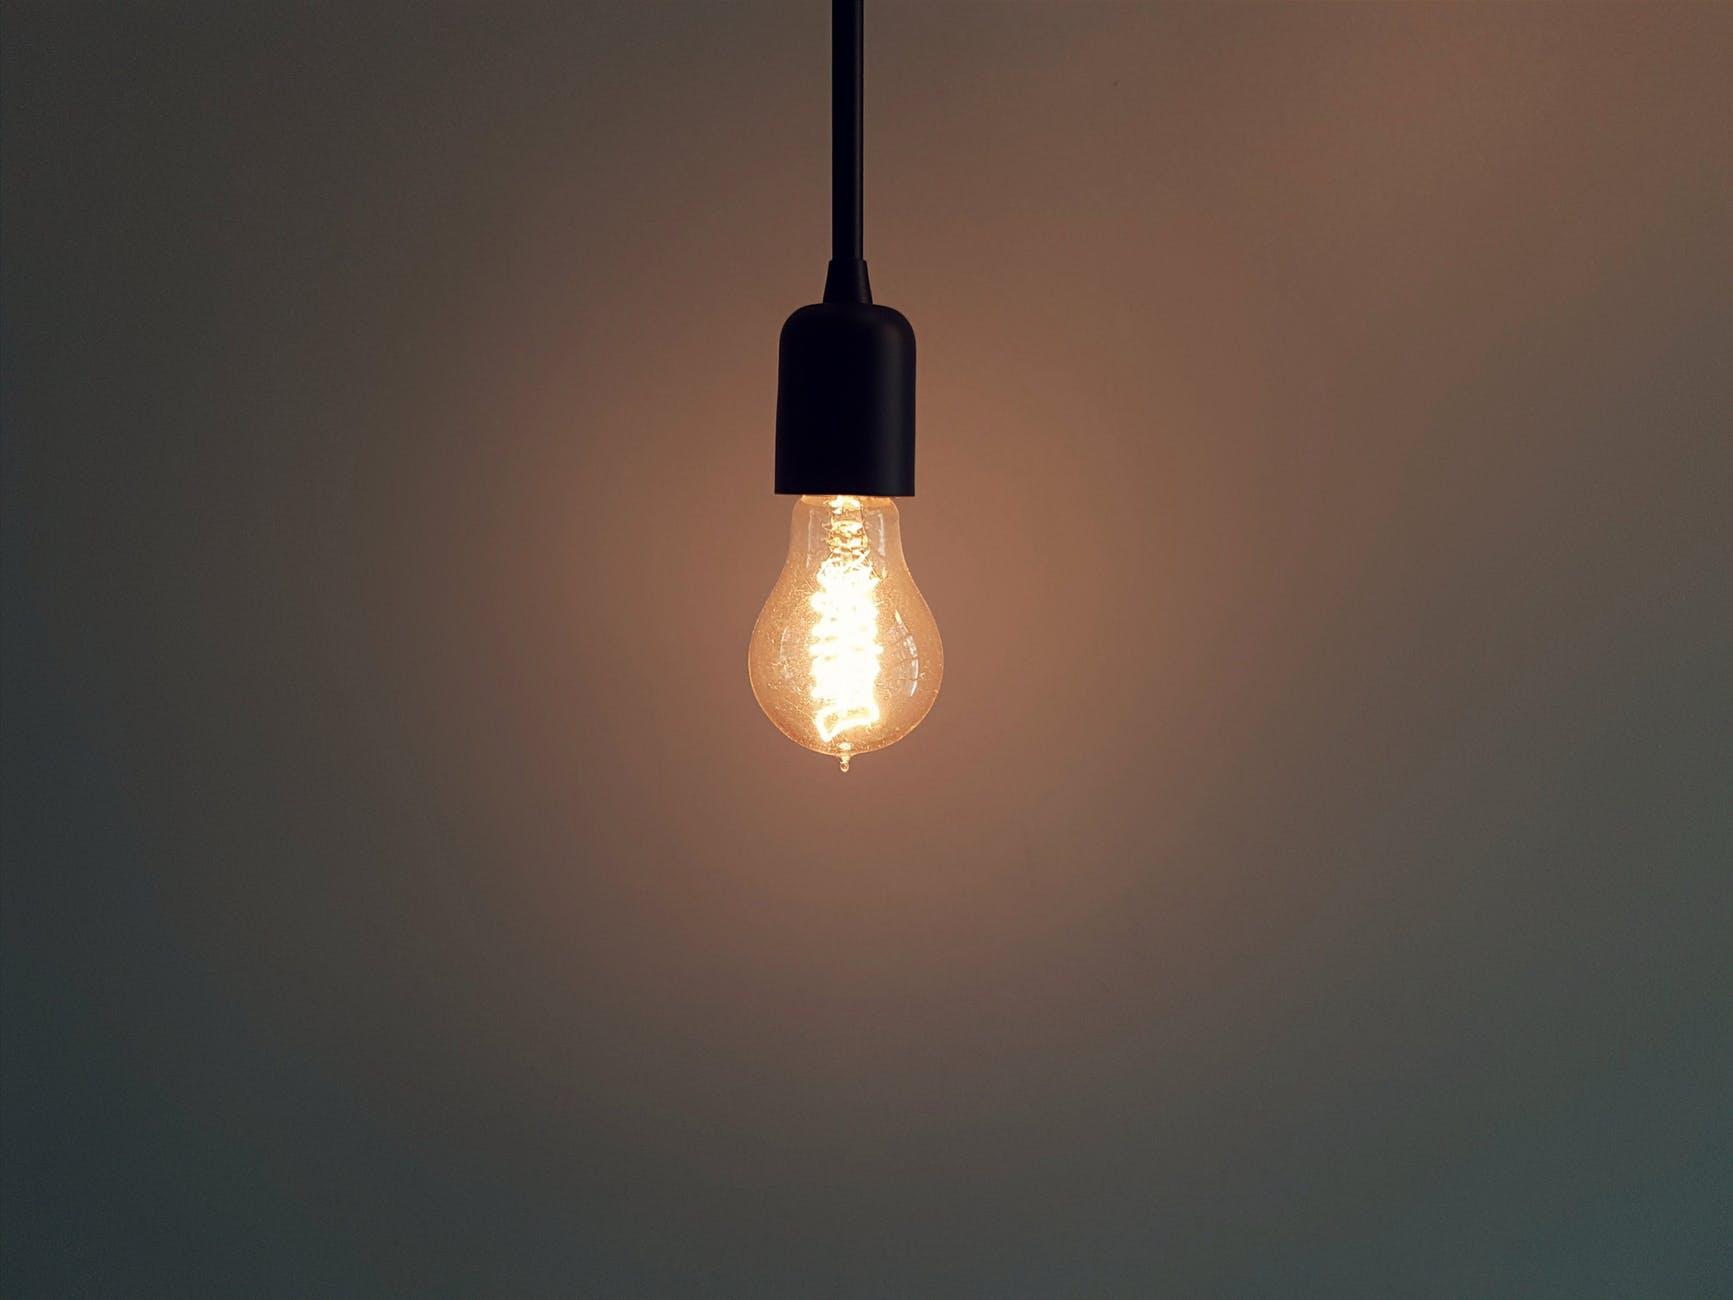 lightbulb light wisdom